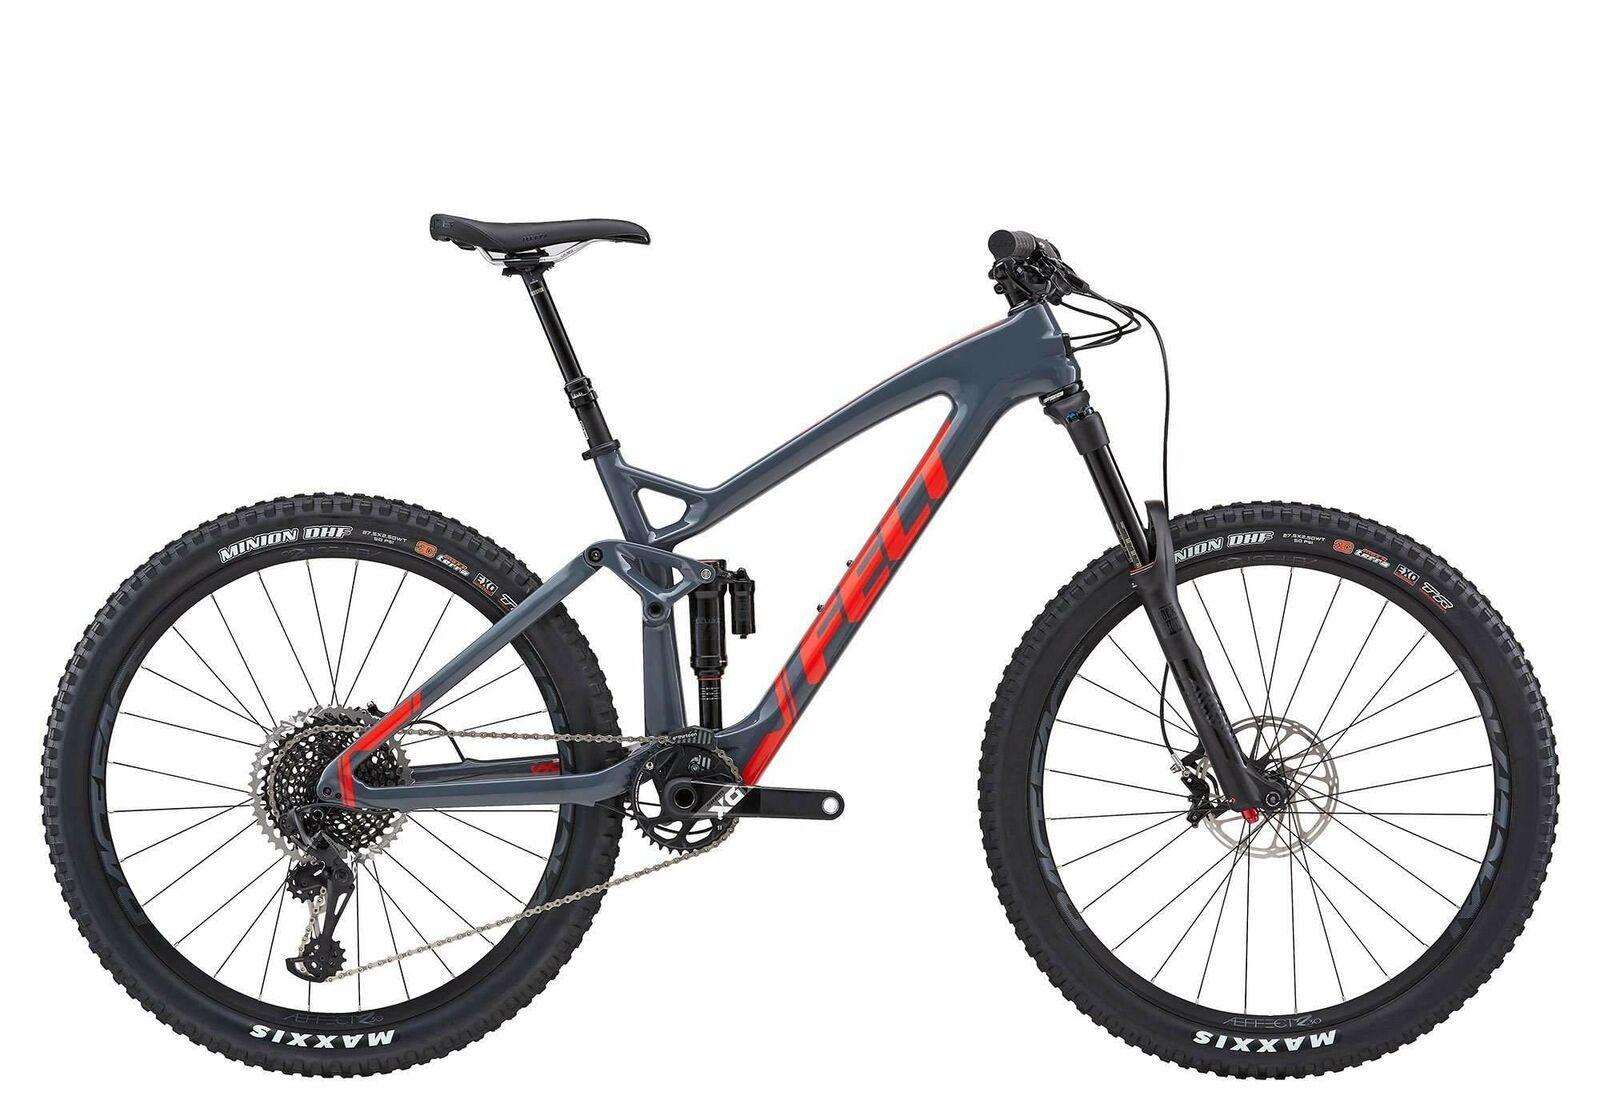 2019 Felt Decree 1 Carbon Full Suspension Mountain Bike Sram Eagle